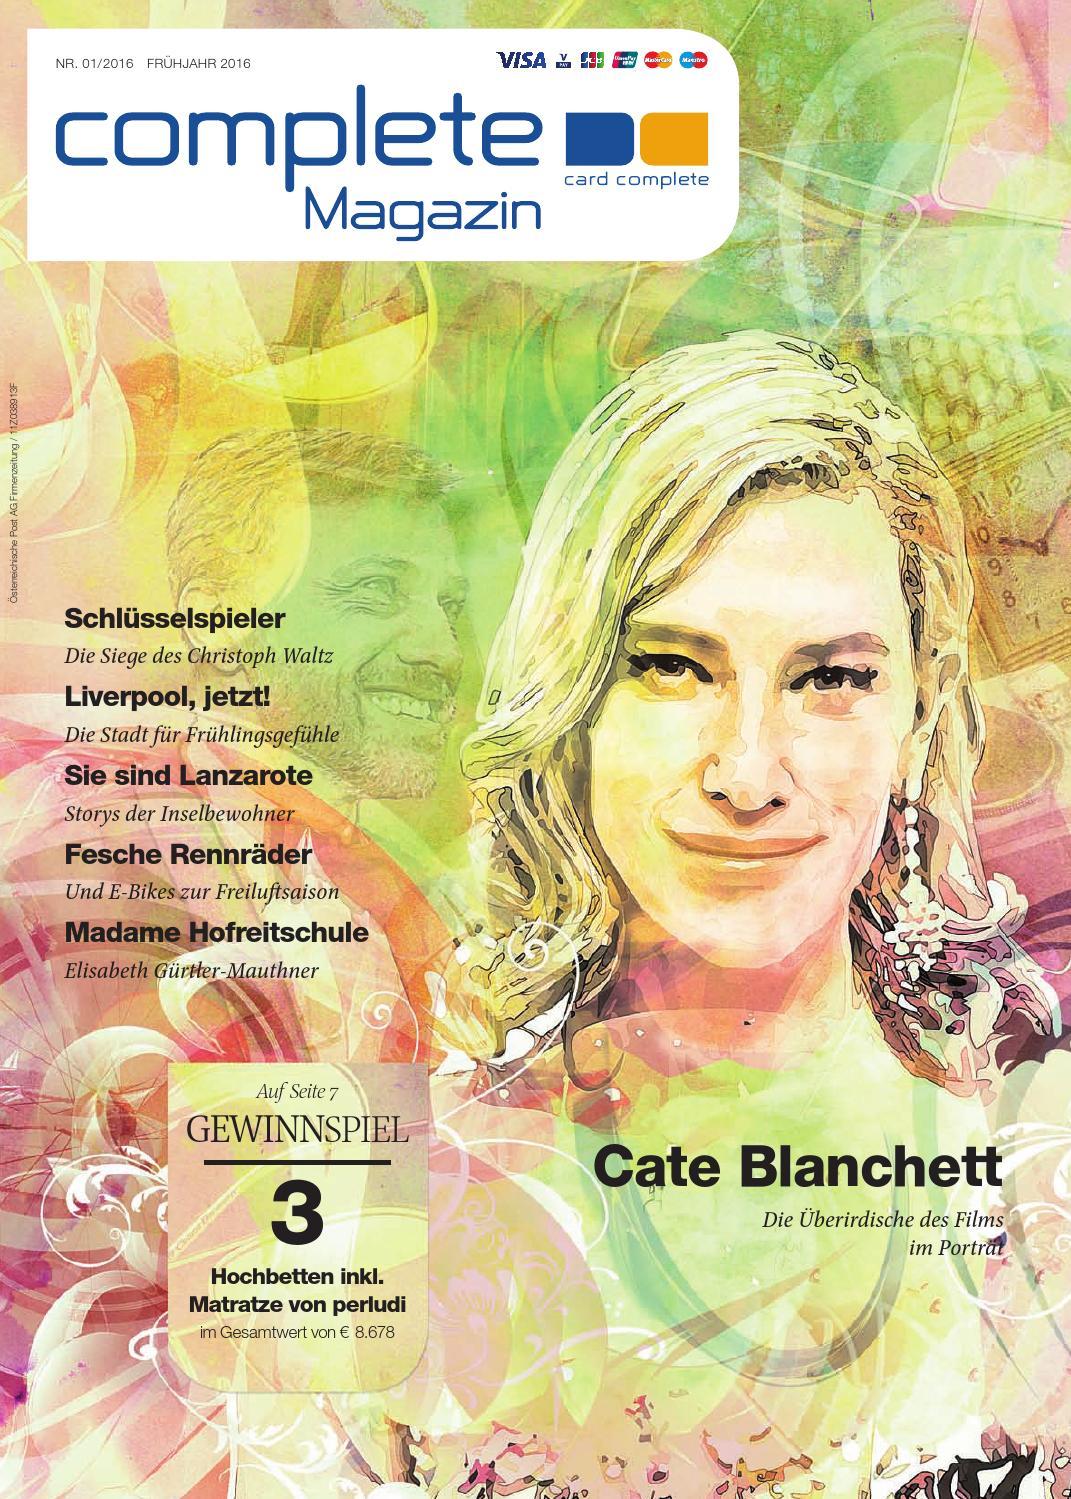 COMPLETE PARTNER 116 by Falter Verlagsgesellschaft m.b.H.